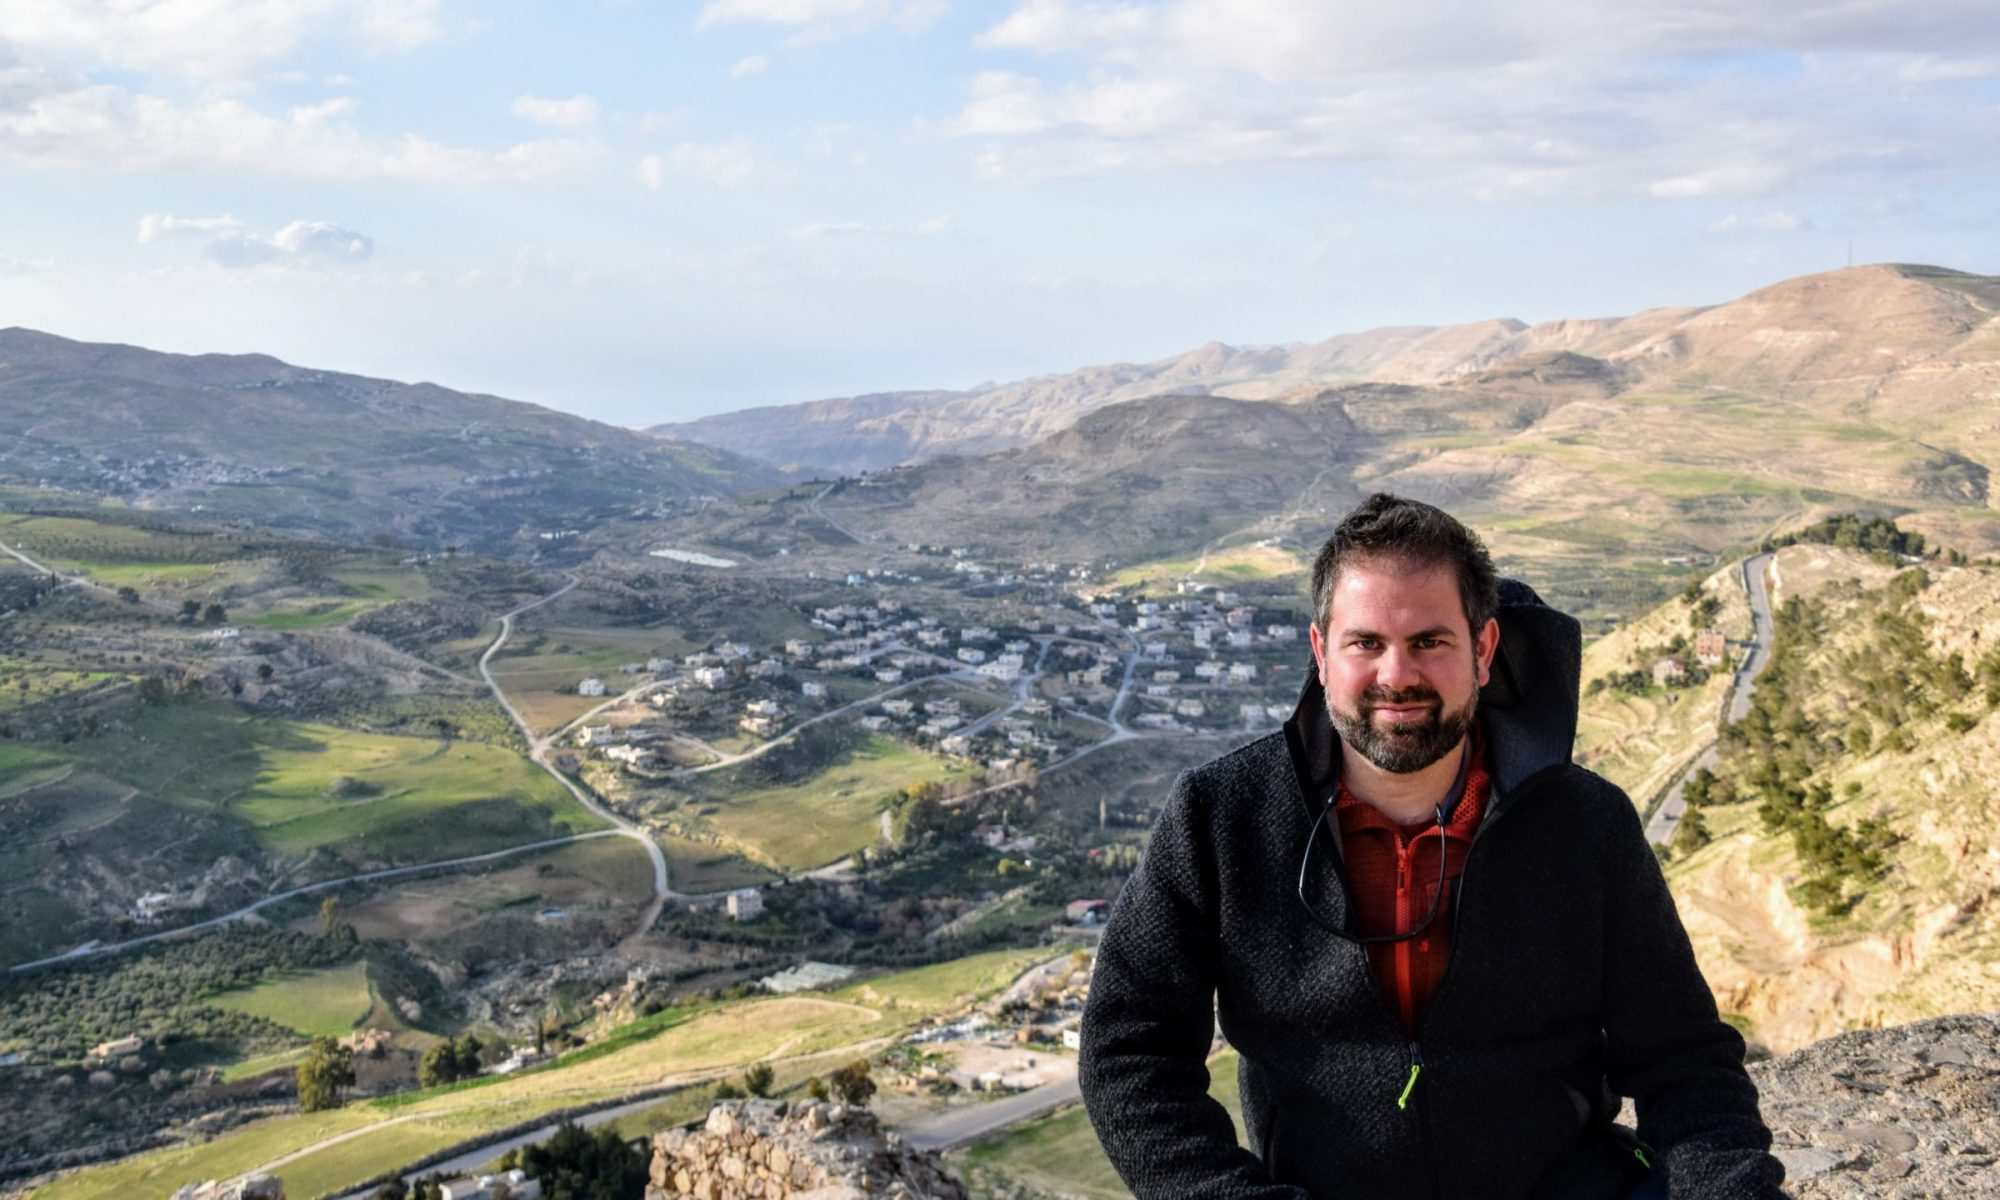 Man sitting on hilltop castle of Karak, Jordan